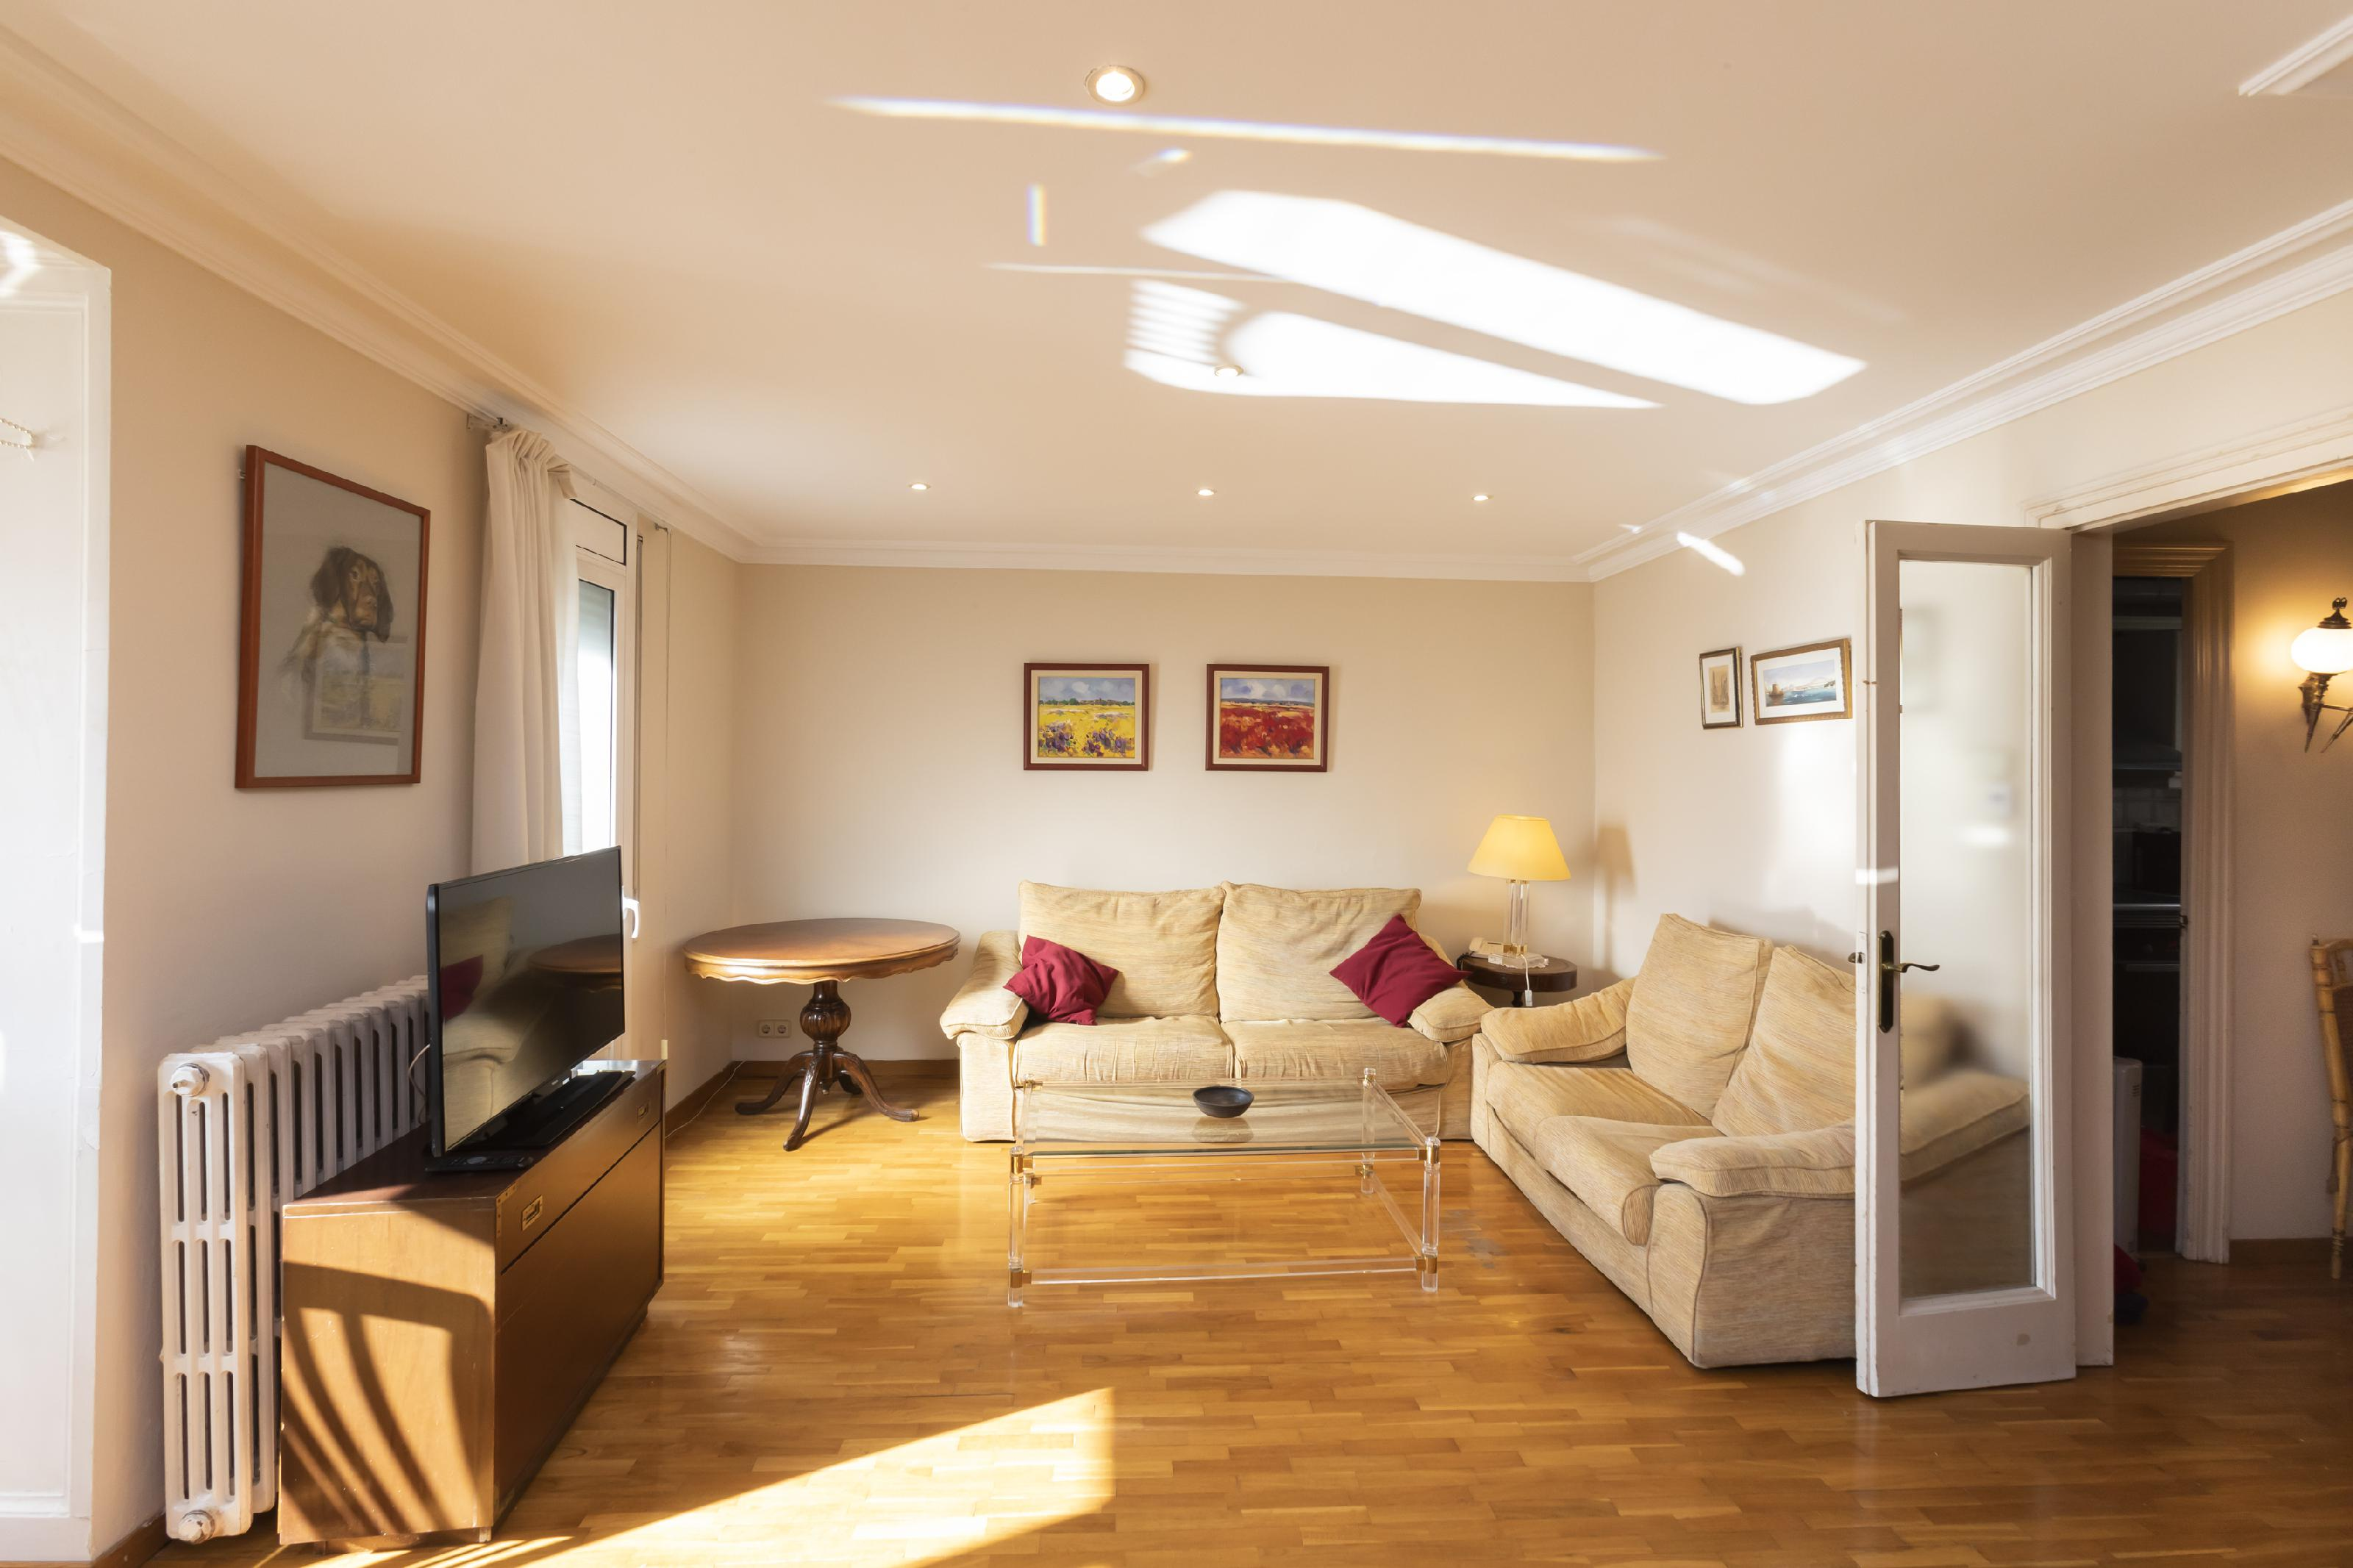 247097 Flat for sale in Sarrià-Sant Gervasi, Sant Gervasi-Galvany 3